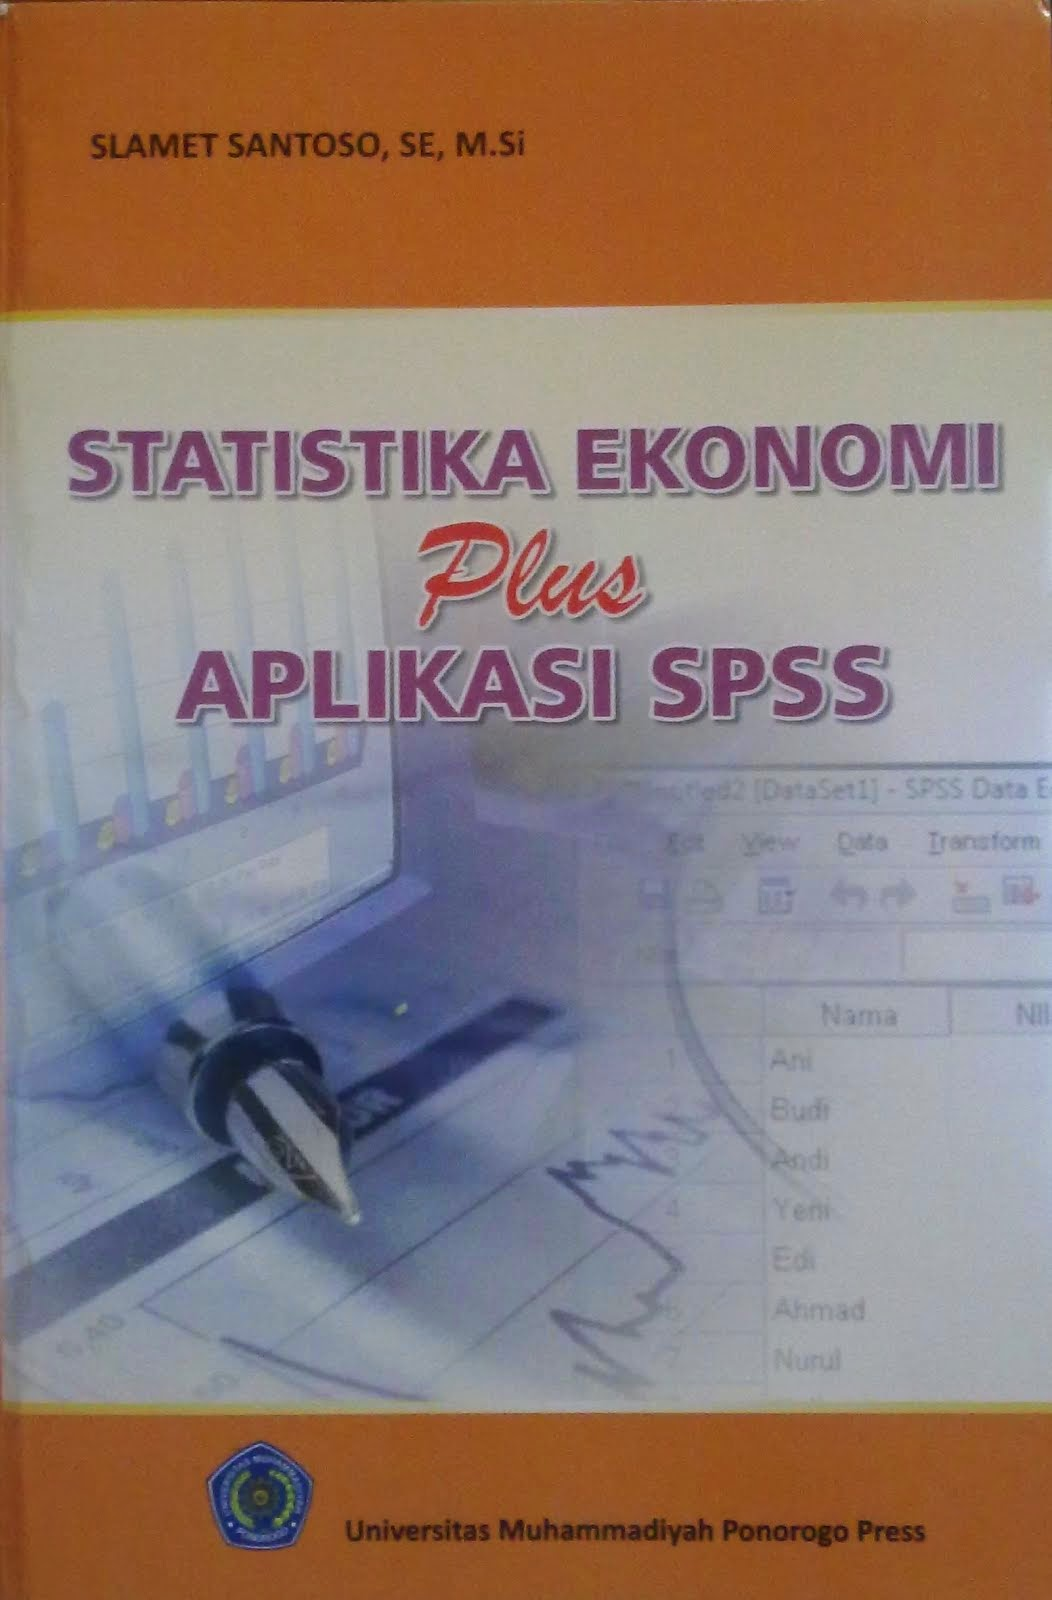 Penerbit : Univ. Muhammadiyah Ponorogo Press, Maret 2013